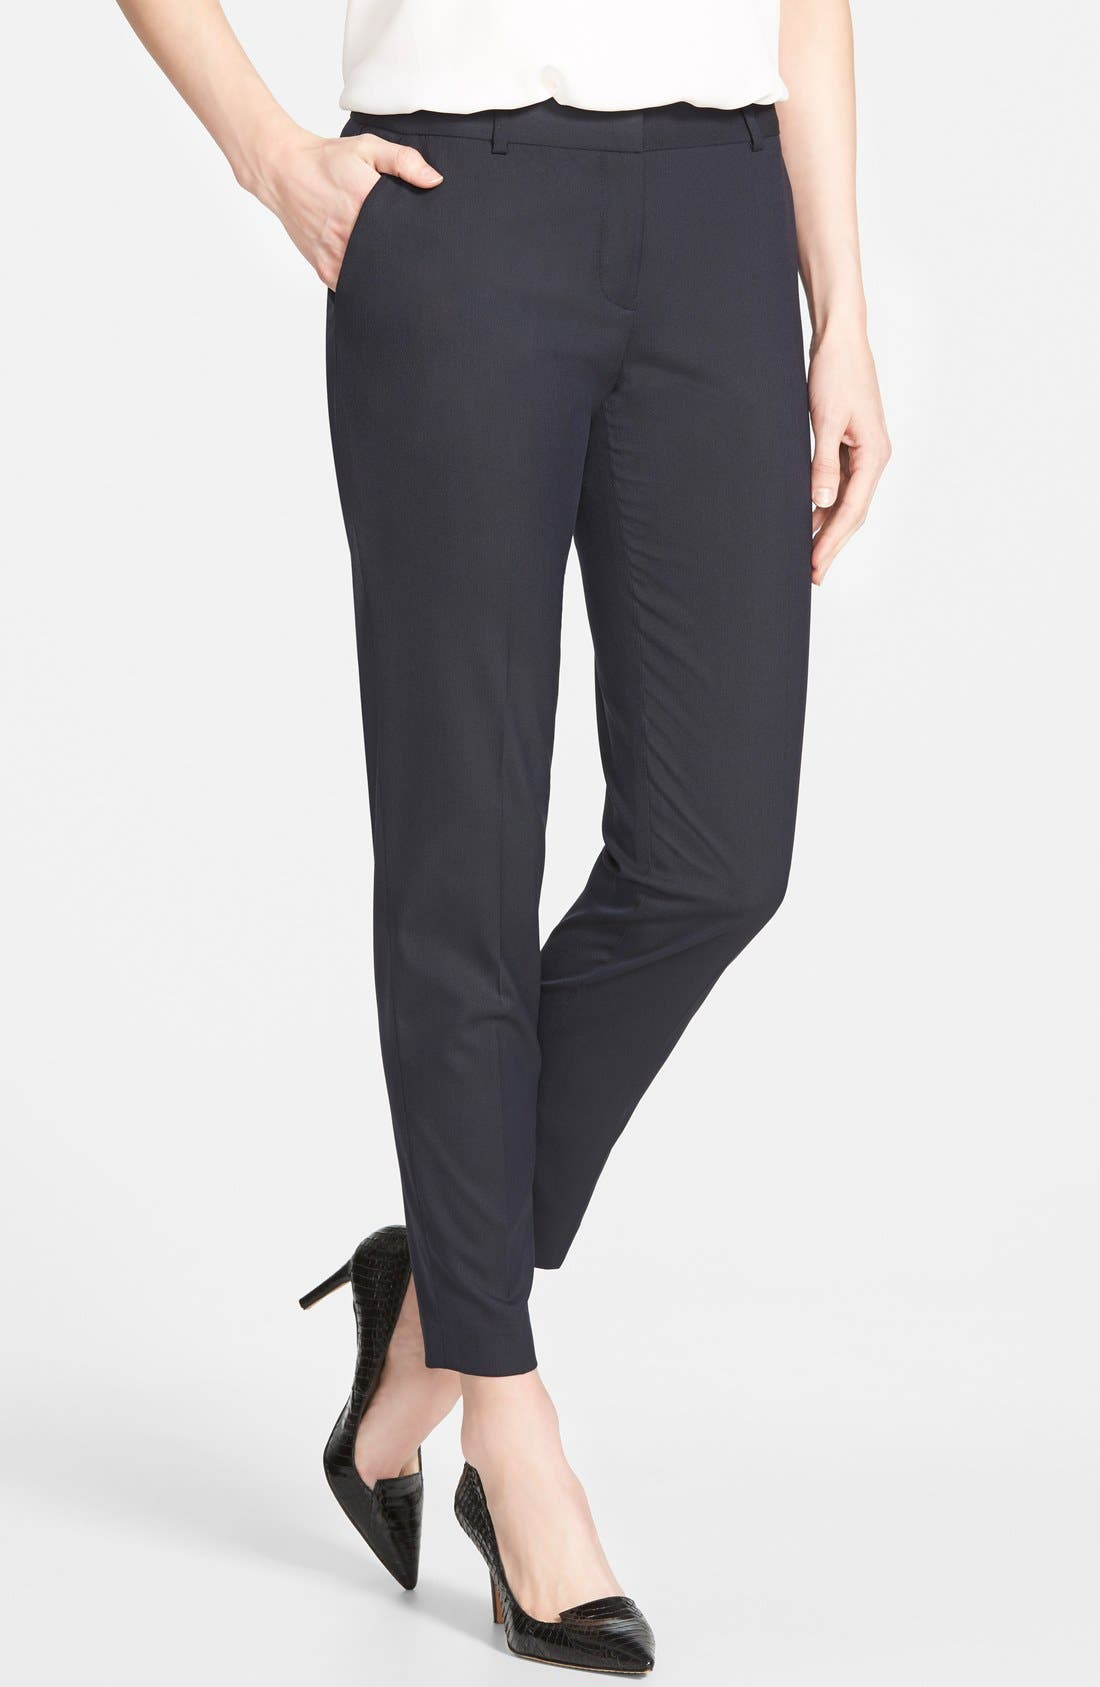 Alternate Image 1 Selected - Halogen® 'Taylor' Lapis Pattern Suit Pants (Regular & Petite)